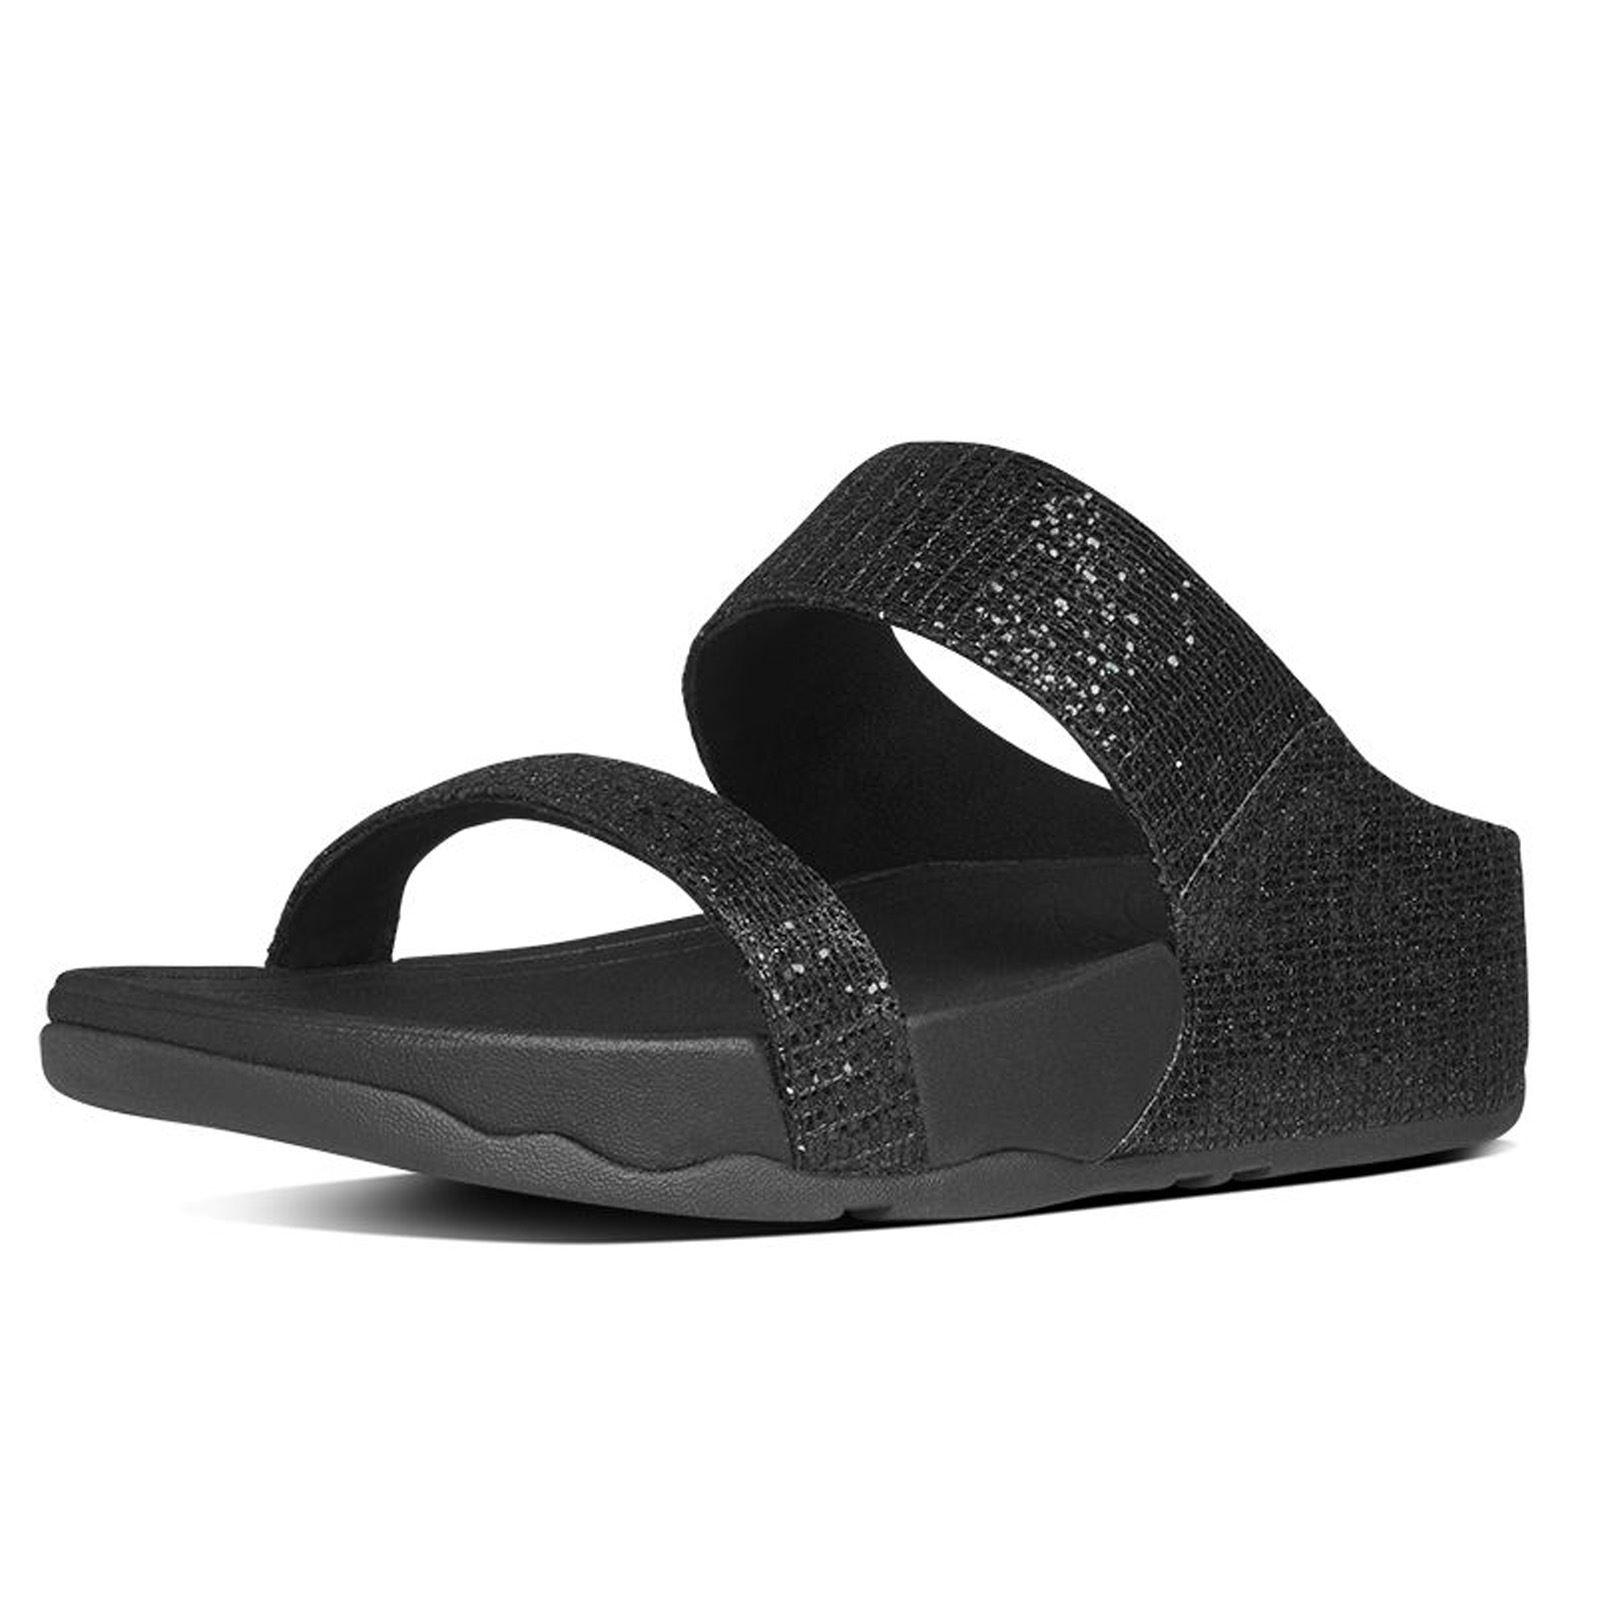 Womens sandals ebay - Fitflop Lulu Superglitz Slide Black Womens Sandals